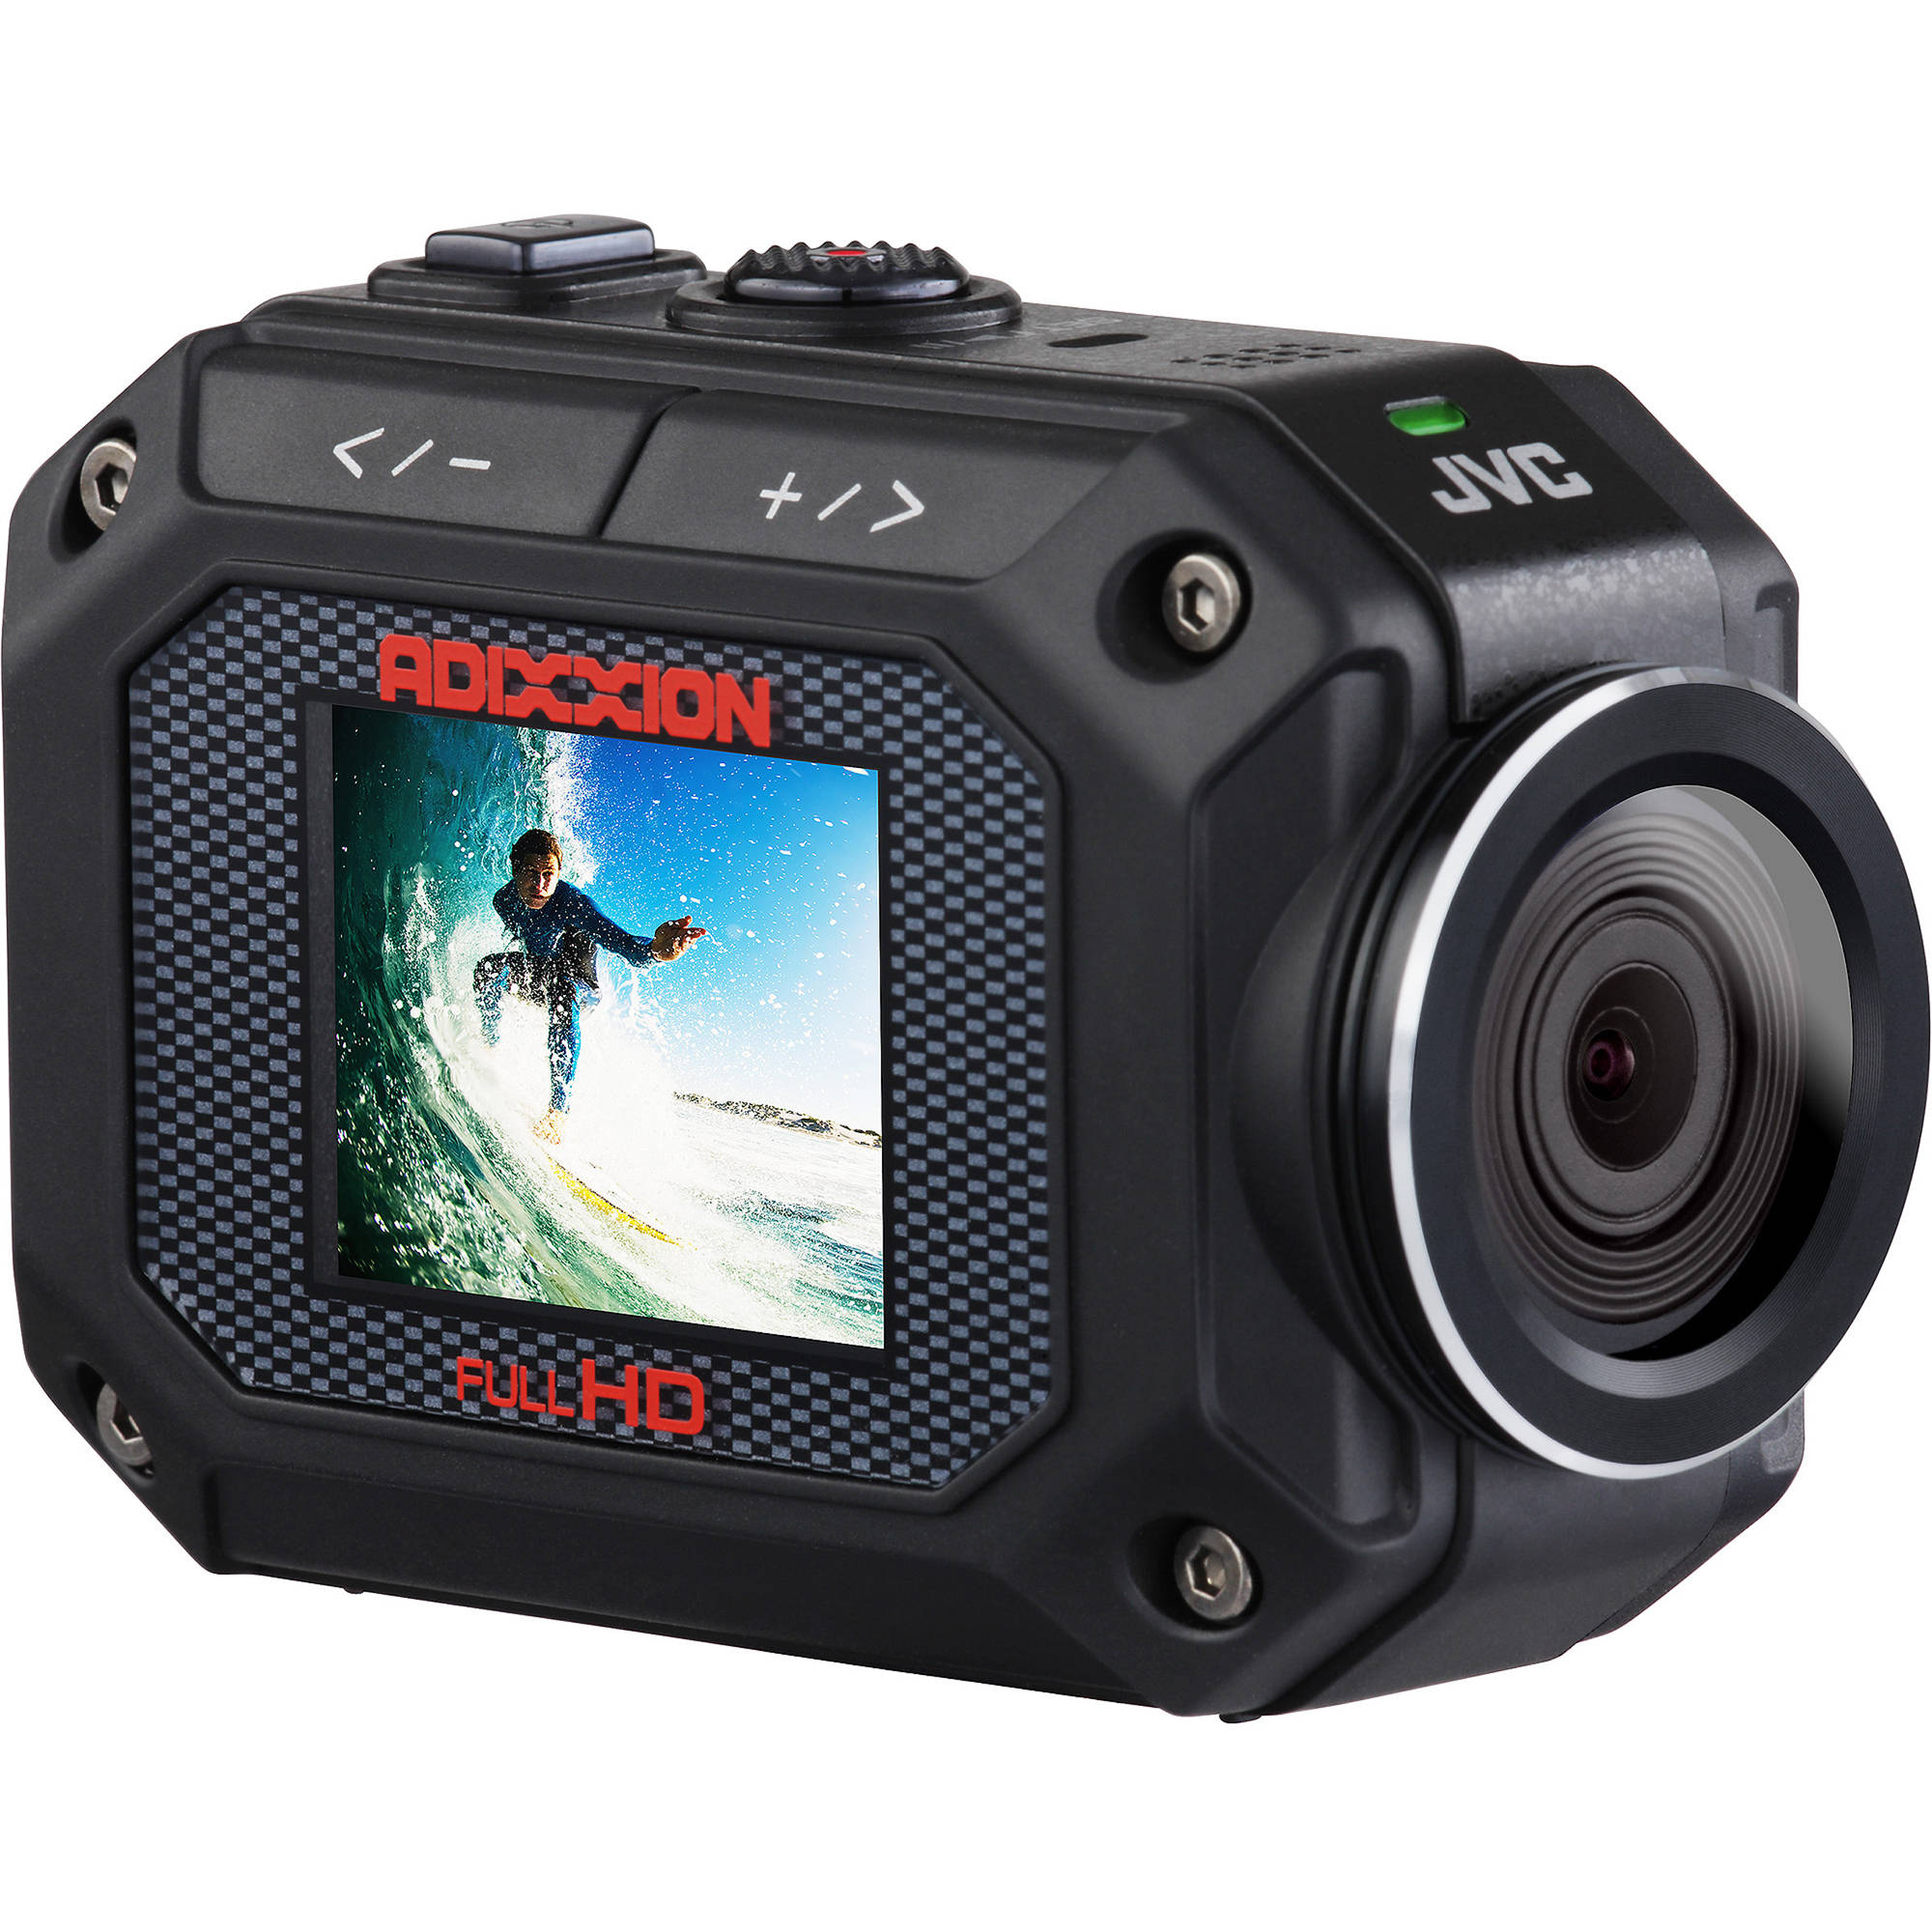 jvc gc xa2 adixxion action camera gc xa2bus b h photo video rh bhphotovideo com jvc action camera gc-xa1 manual jvc action camera gc-xa1be manual